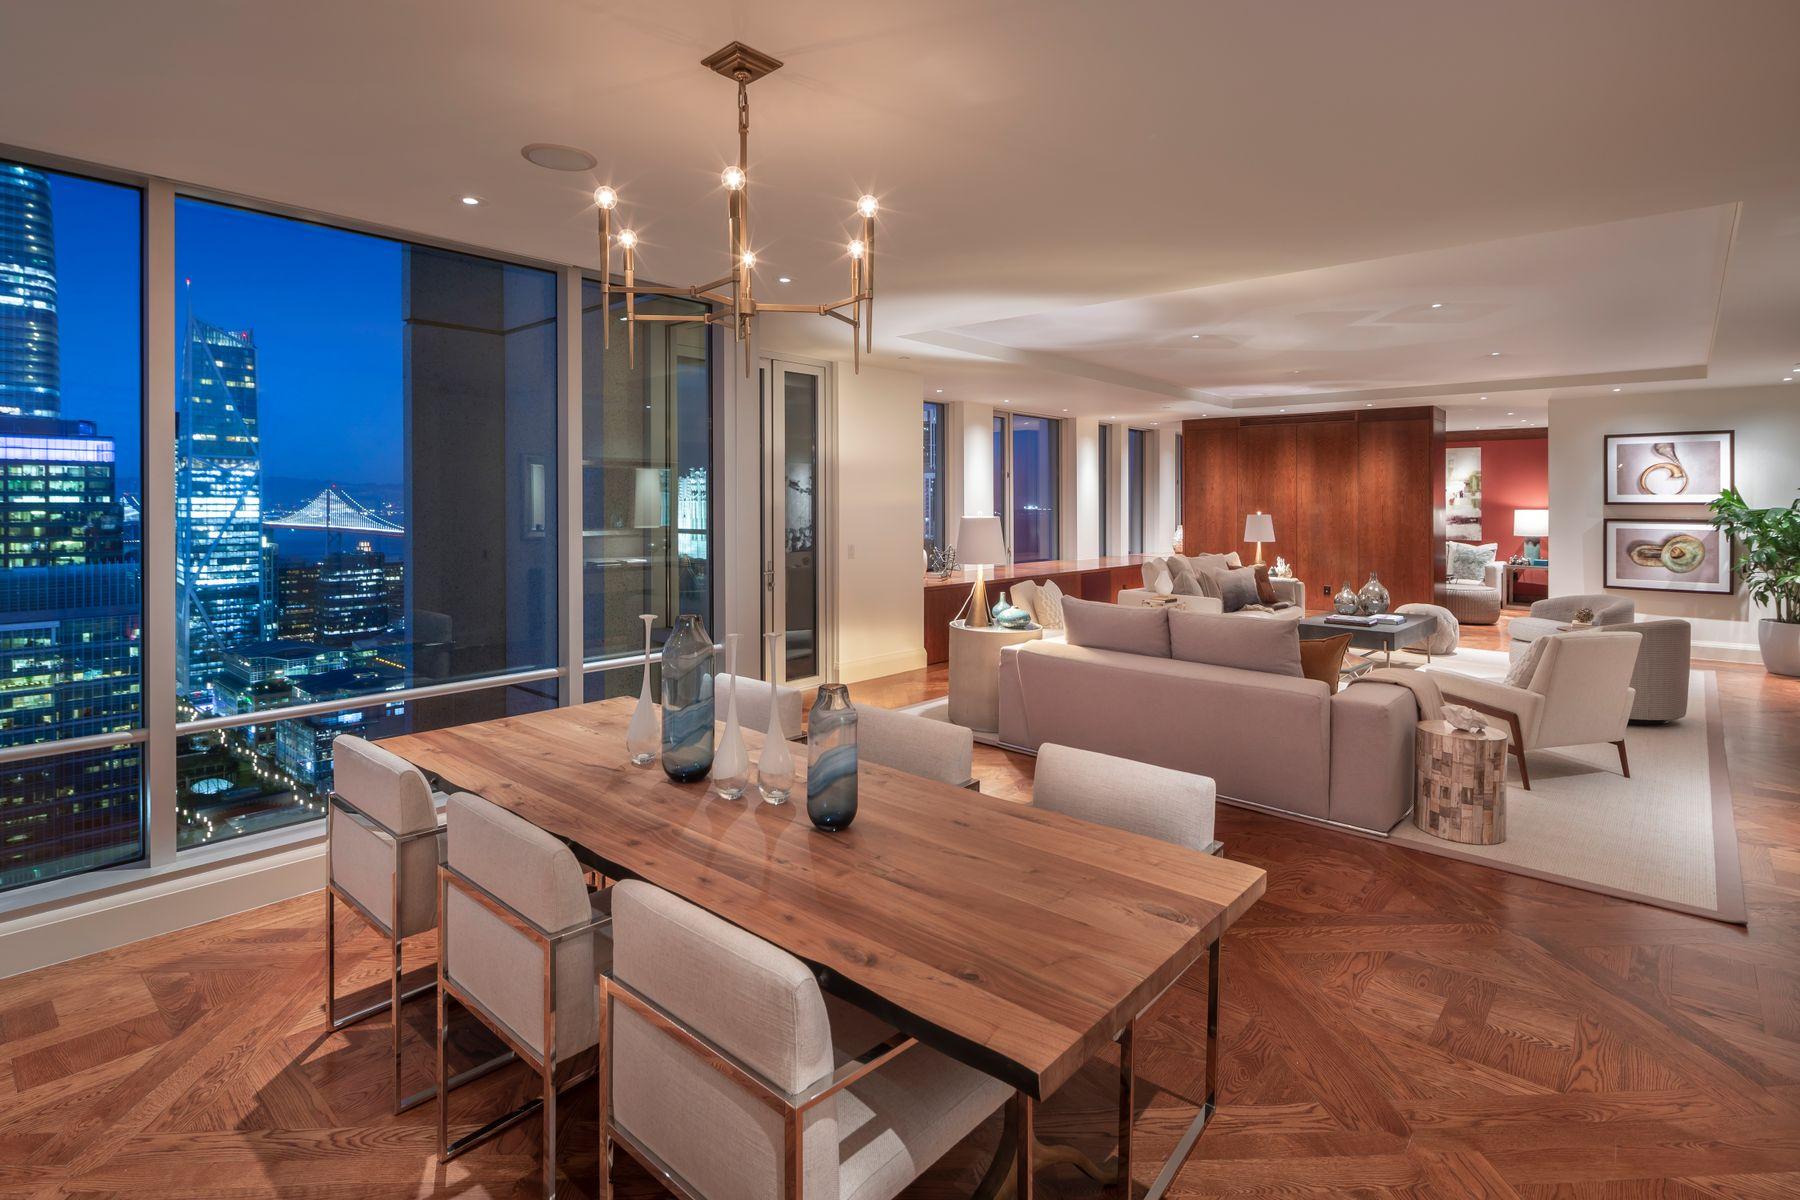 Condominiums 为 销售 在 3,200sf St Regis Residence! 旧金山, 加利福尼亚州 94105 美国